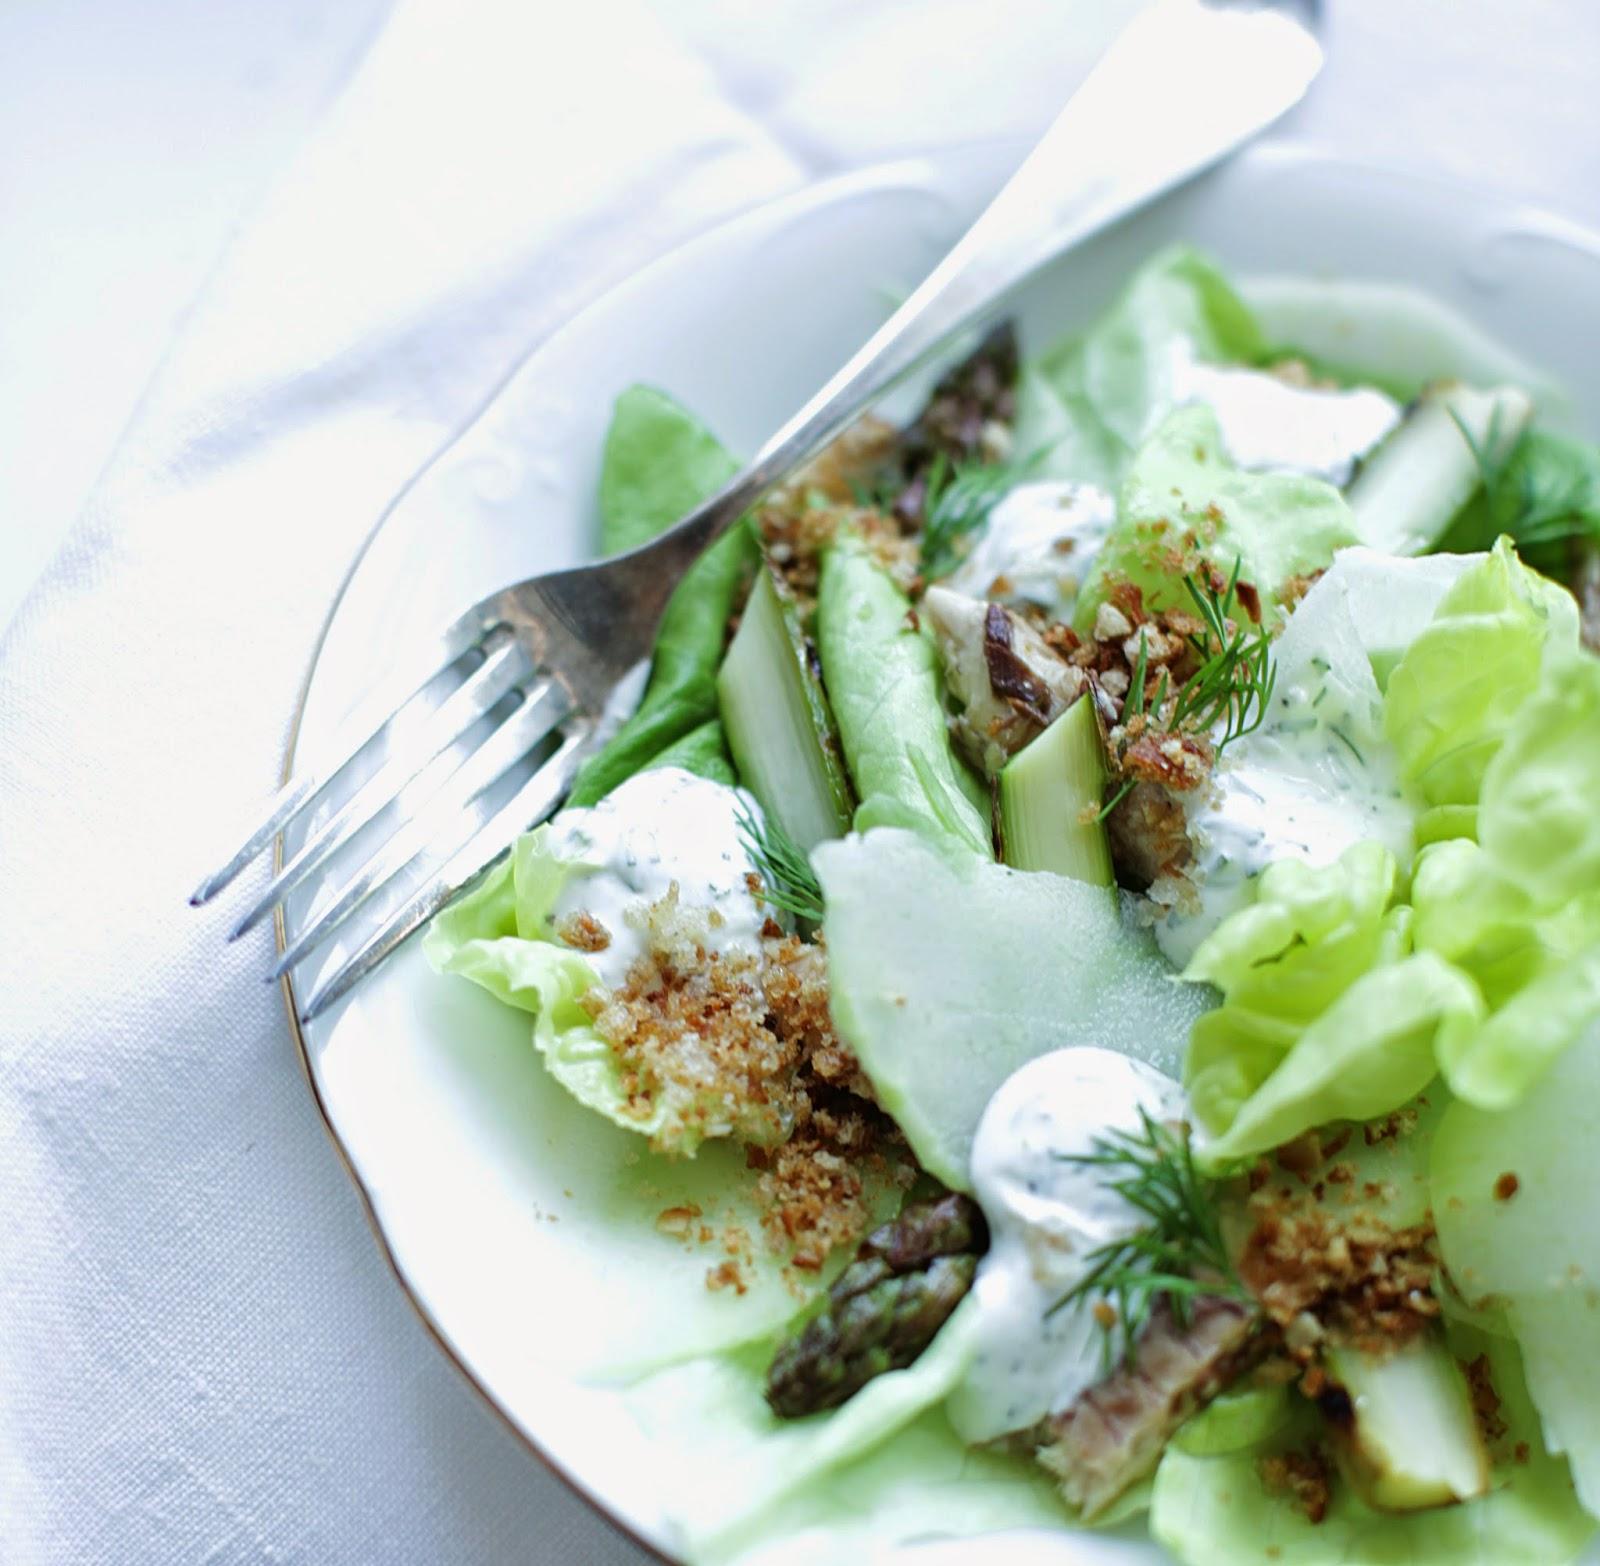 http://our-favorite-apple-pie.blogspot.com/2014/05/zielona-saata-z-koperkowym-sosem.html